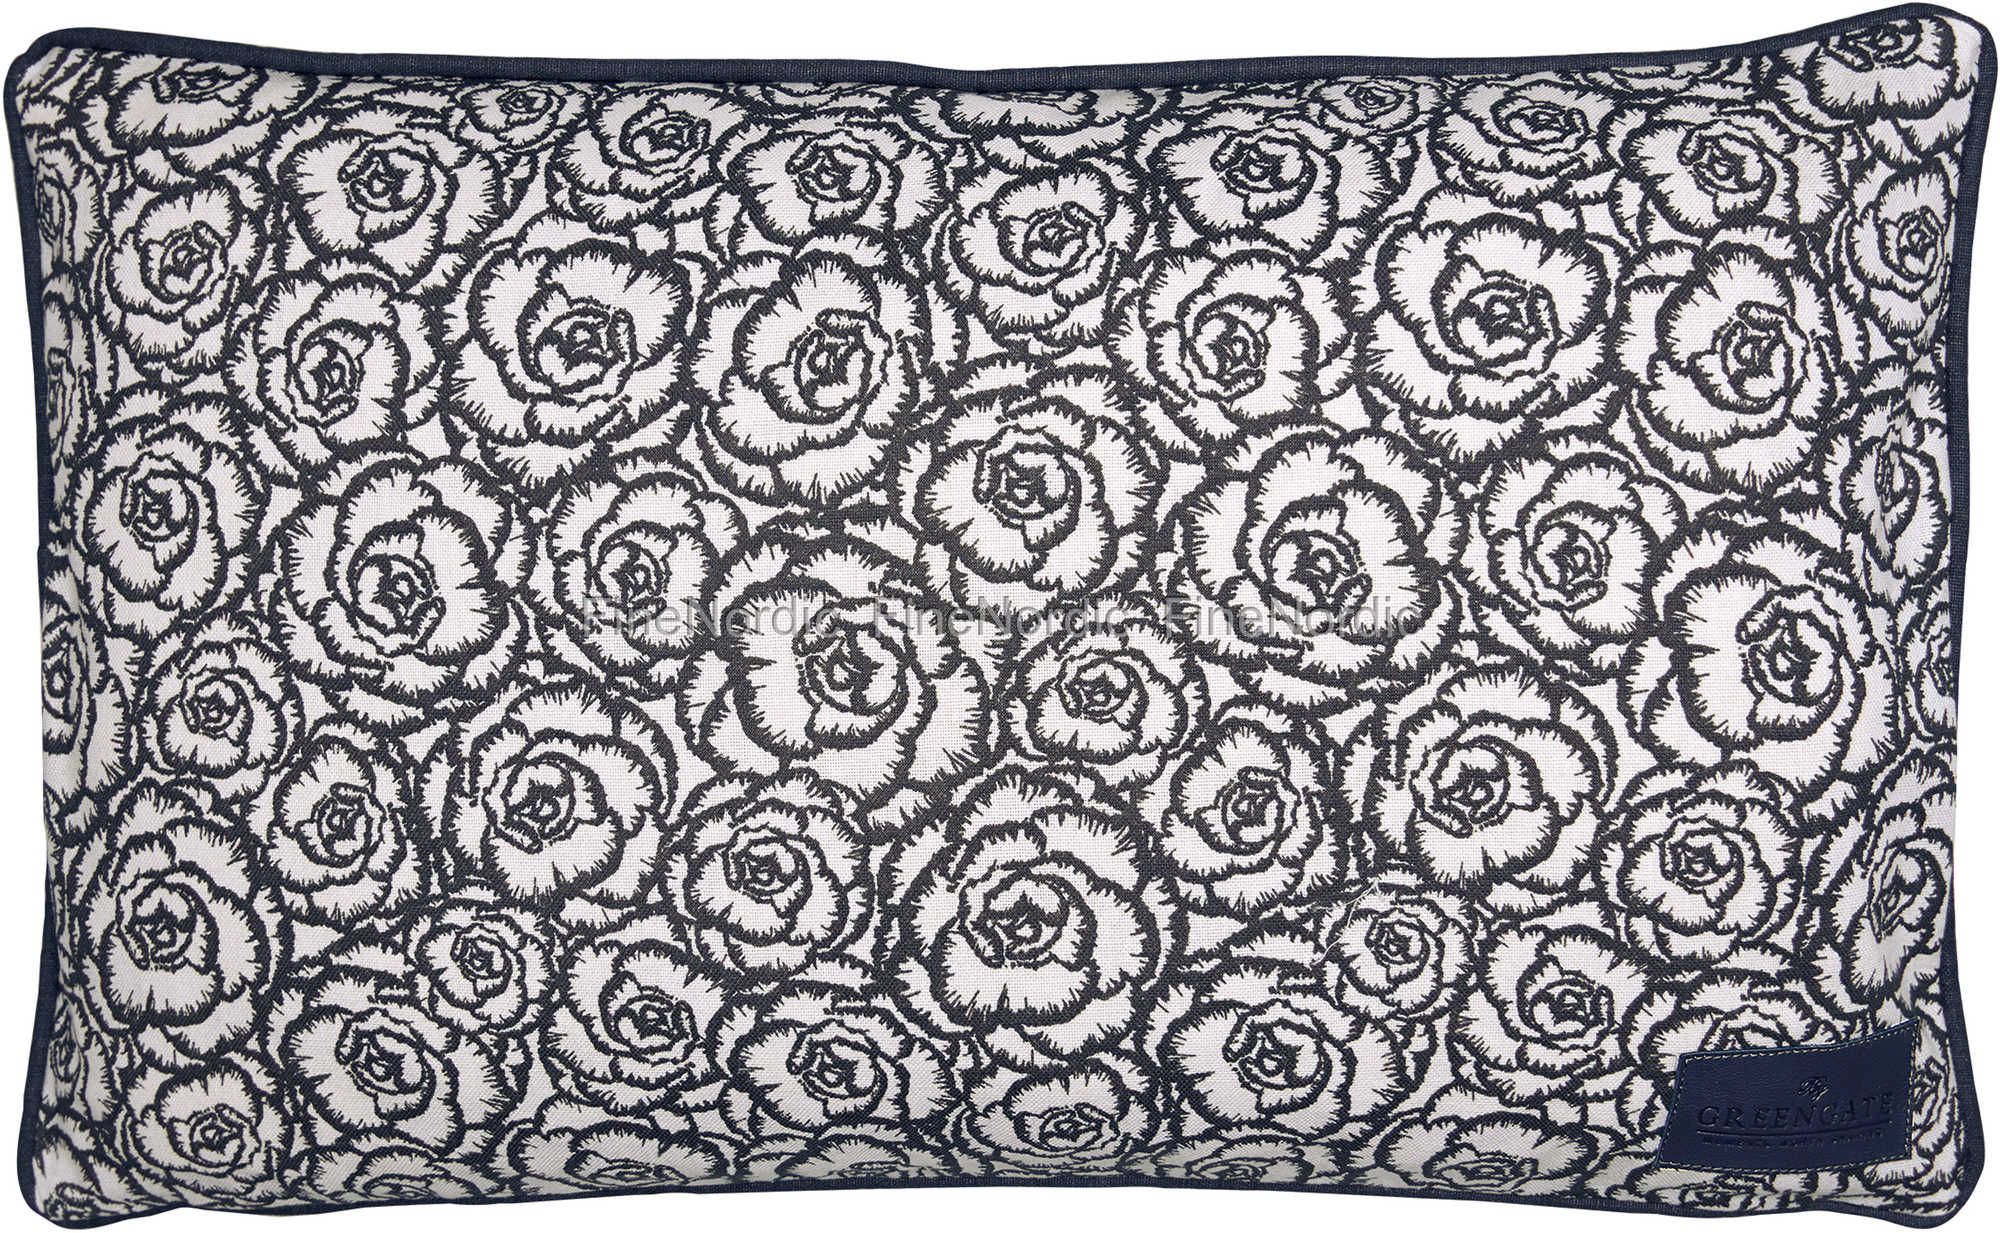 greengate gatenoir kissenh lle cushion blossom grey 30 x 50 cm. Black Bedroom Furniture Sets. Home Design Ideas